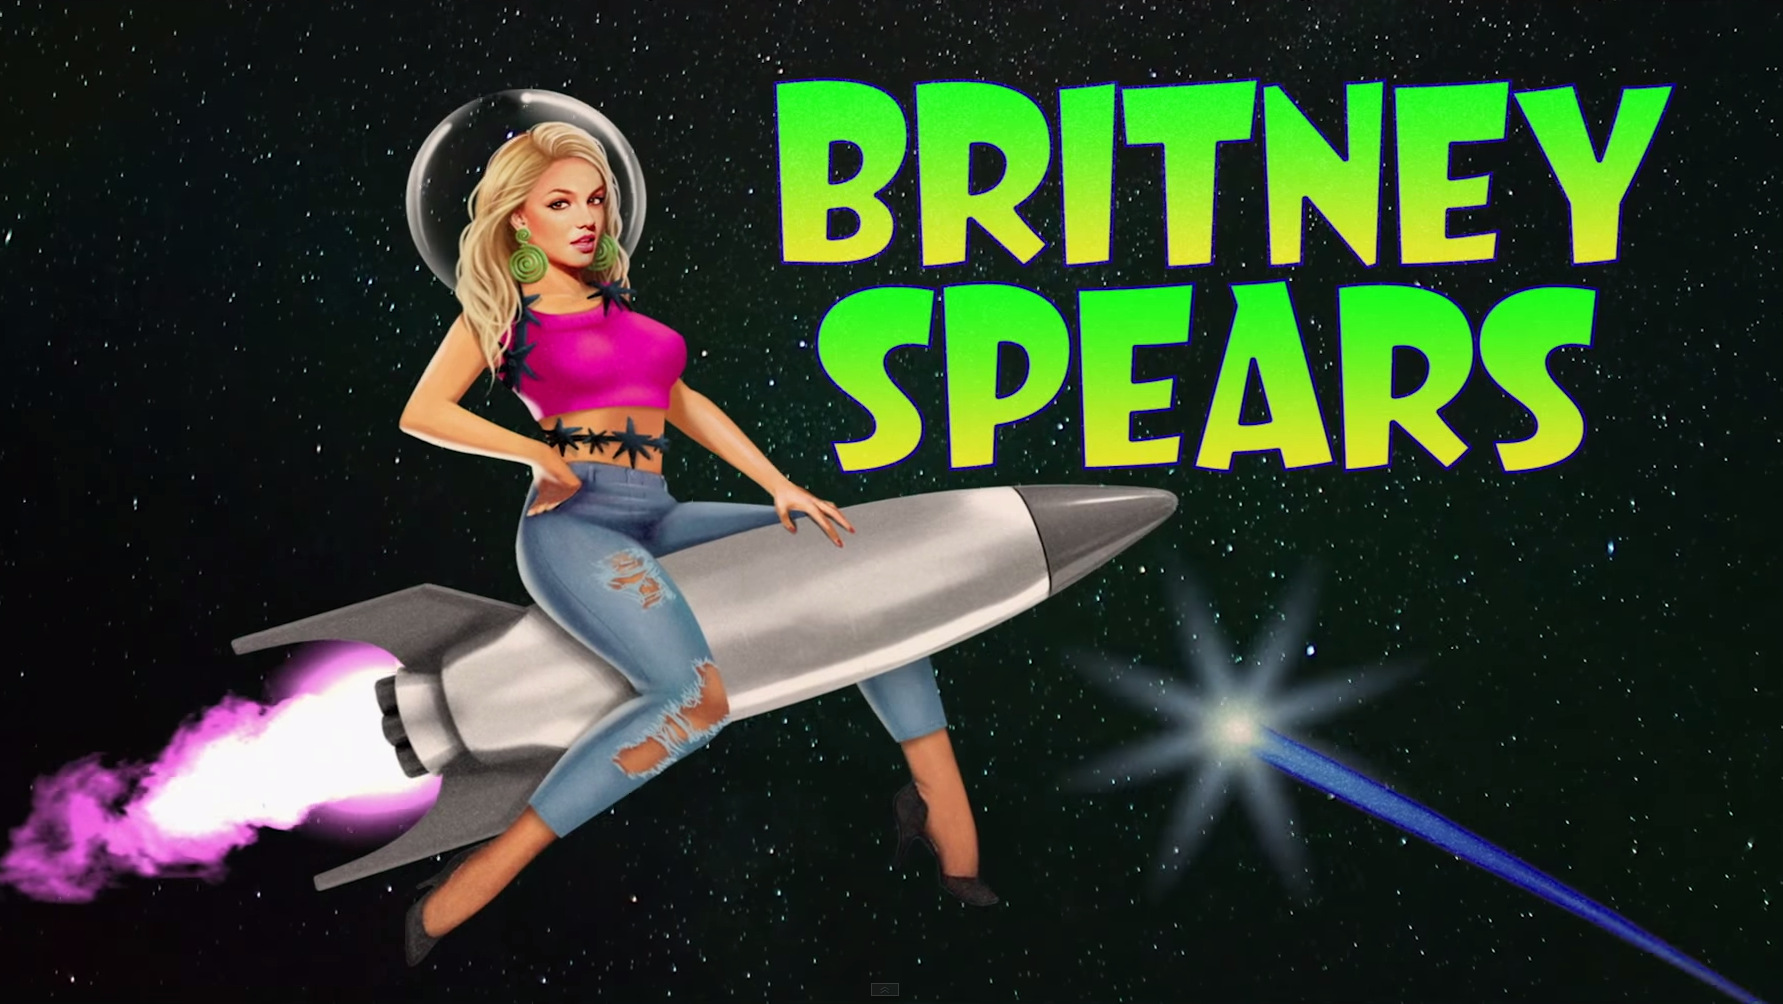 Britney Spears Iggy Azalea Samsung ad (1)